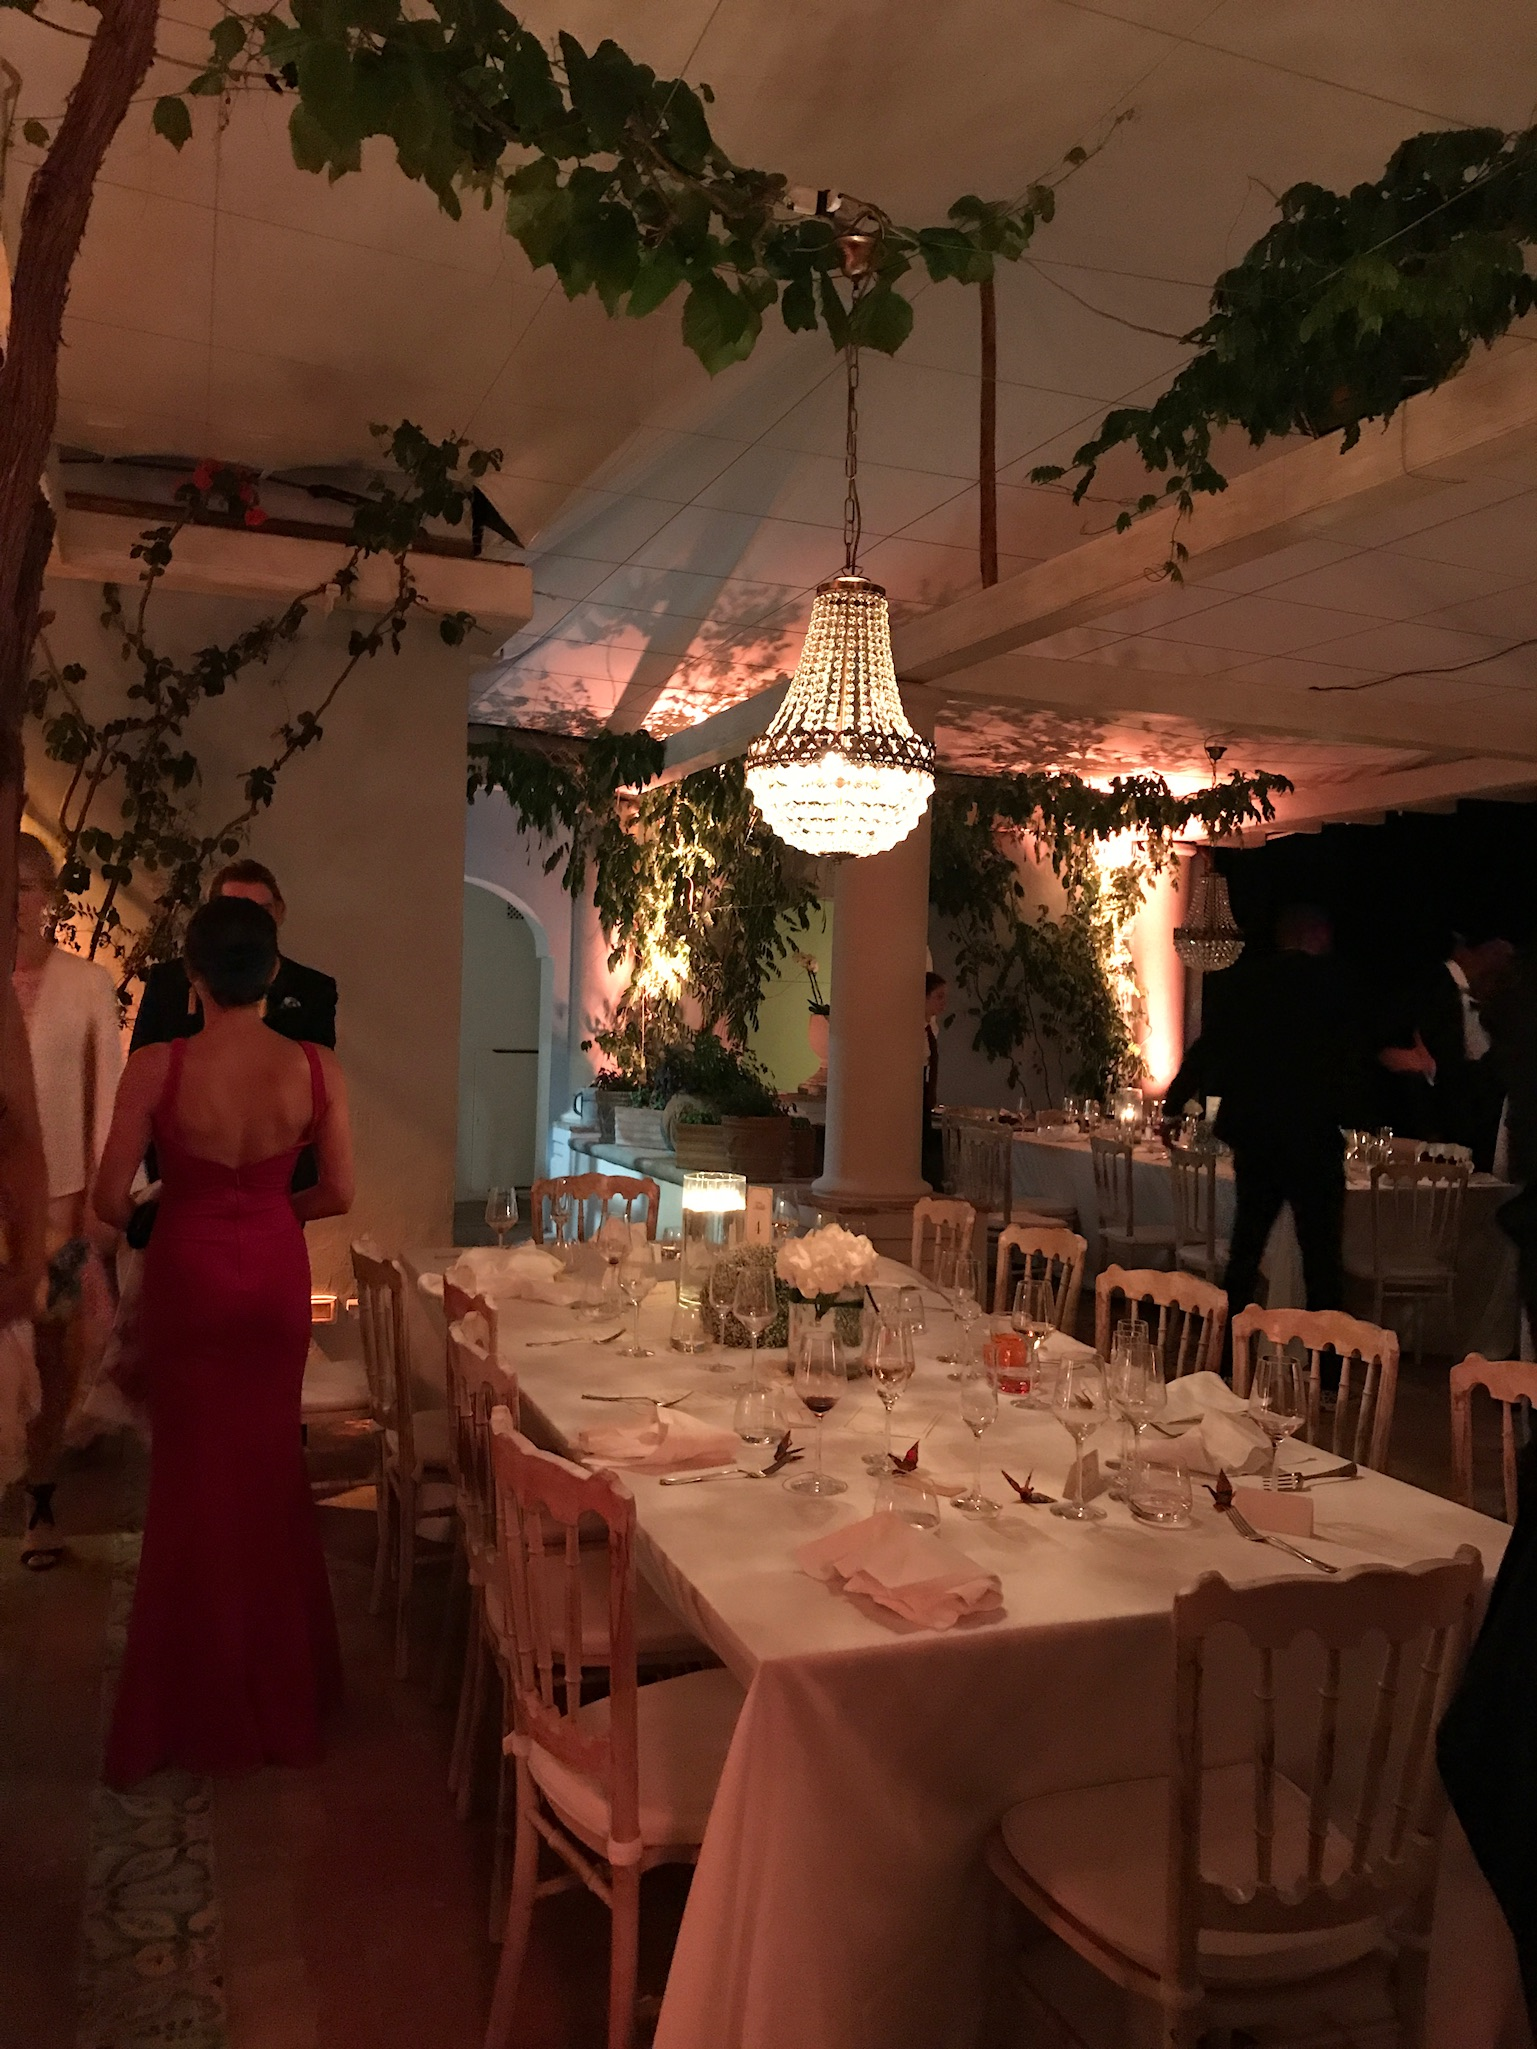 http://www.weddingamalfi.com/wp-content/uploads/Nathalie-and-Benjamin-wedding-in-Positano-21.jpg